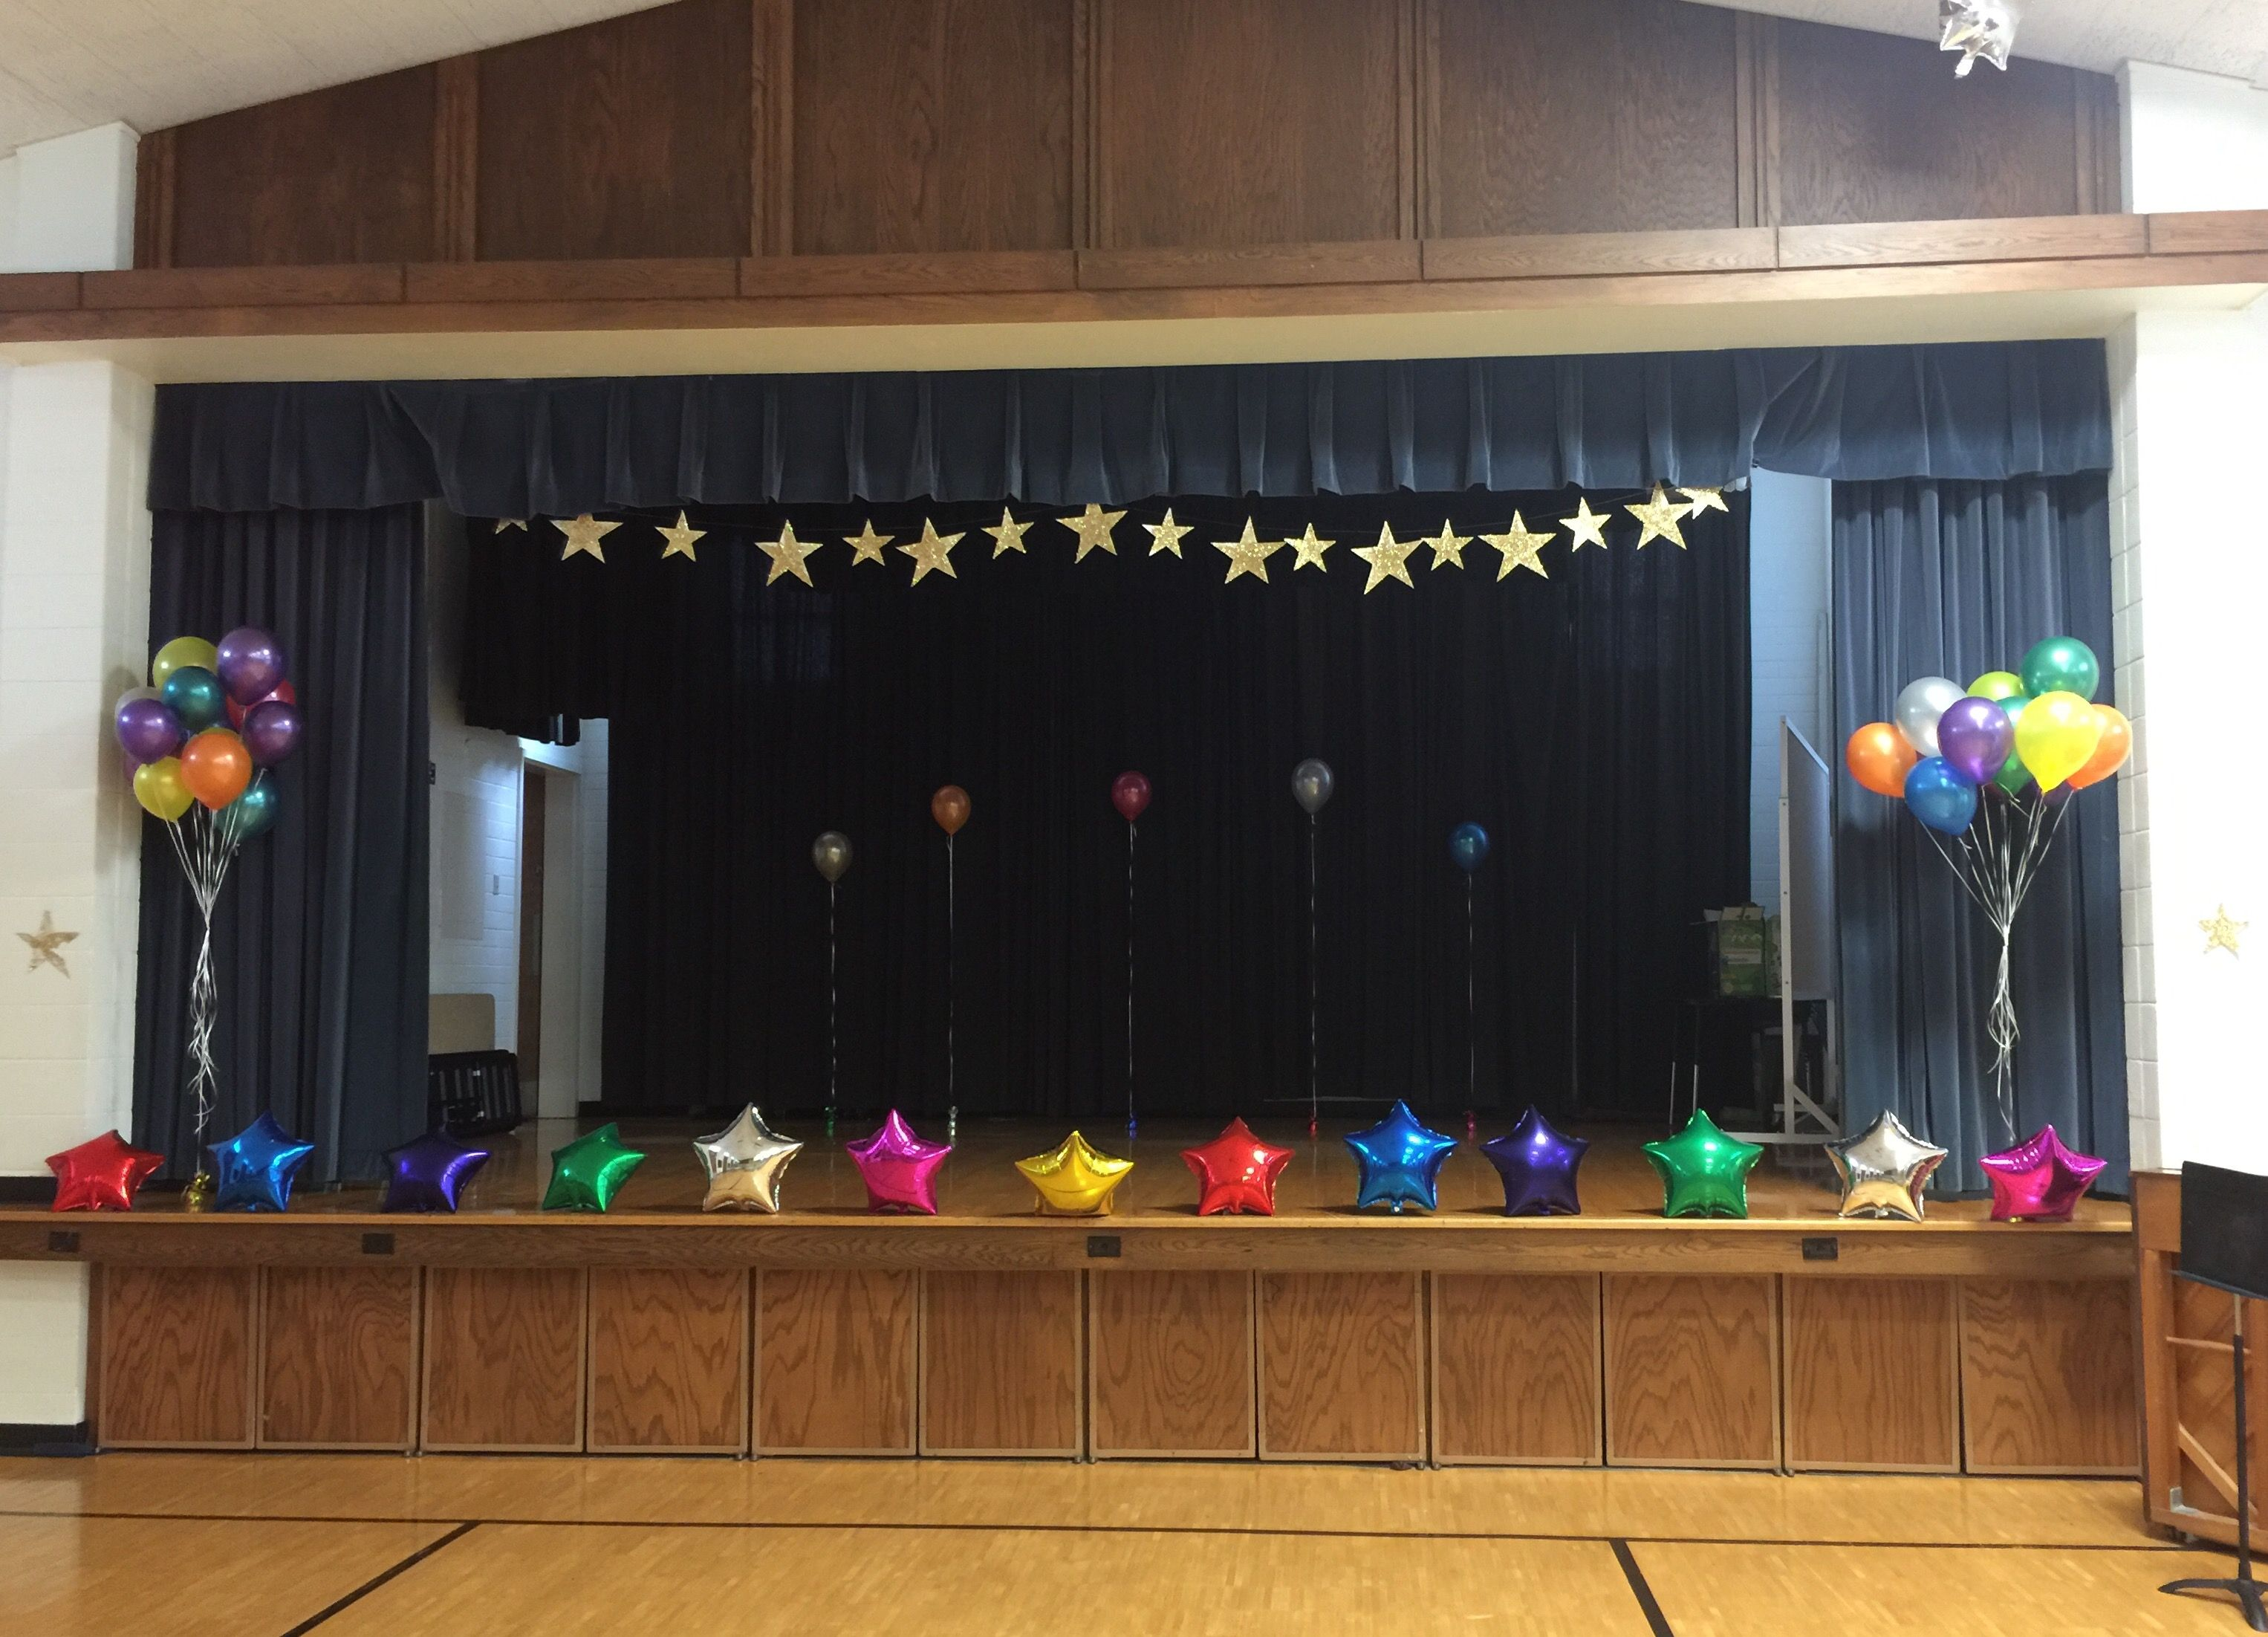 Irving 2nd ward talent show decorations by gail pre - Kindergarten graduation decorations ...